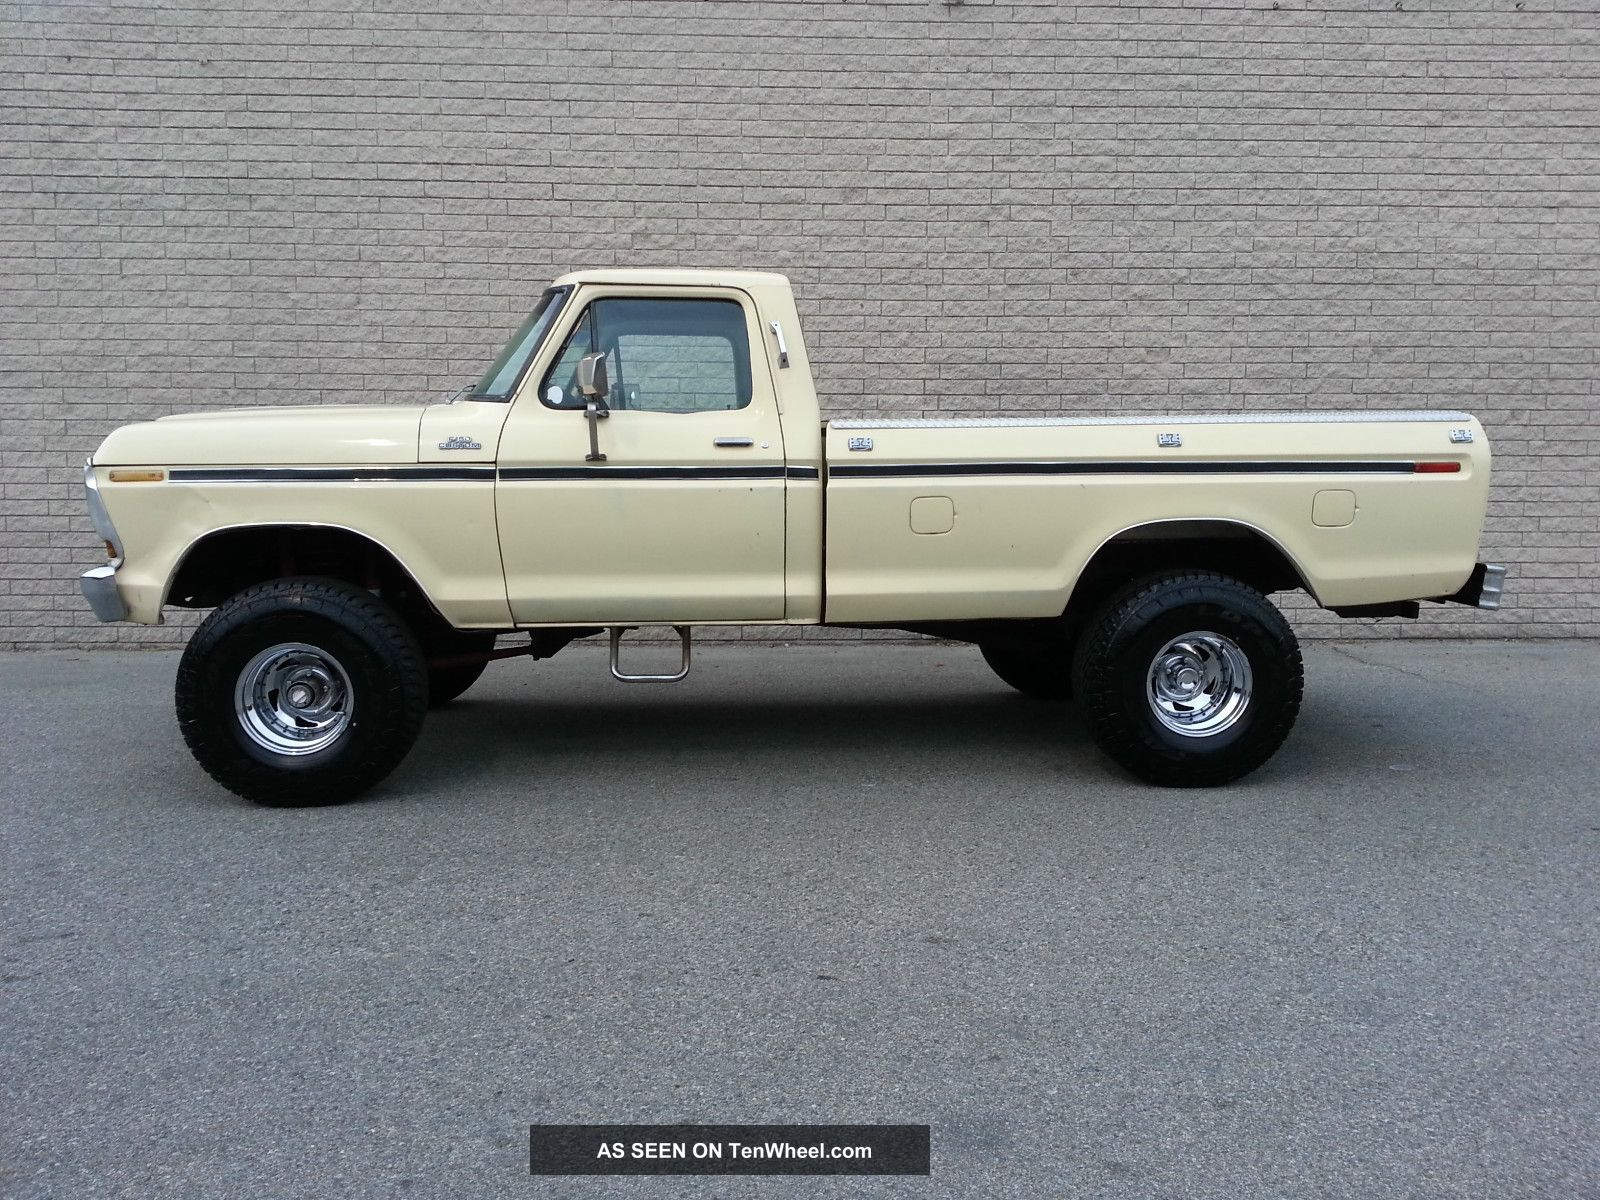 1979 ford f150 4x4 custom 351 v8 rust 4 inch lift automatic 4wd 79 f 150